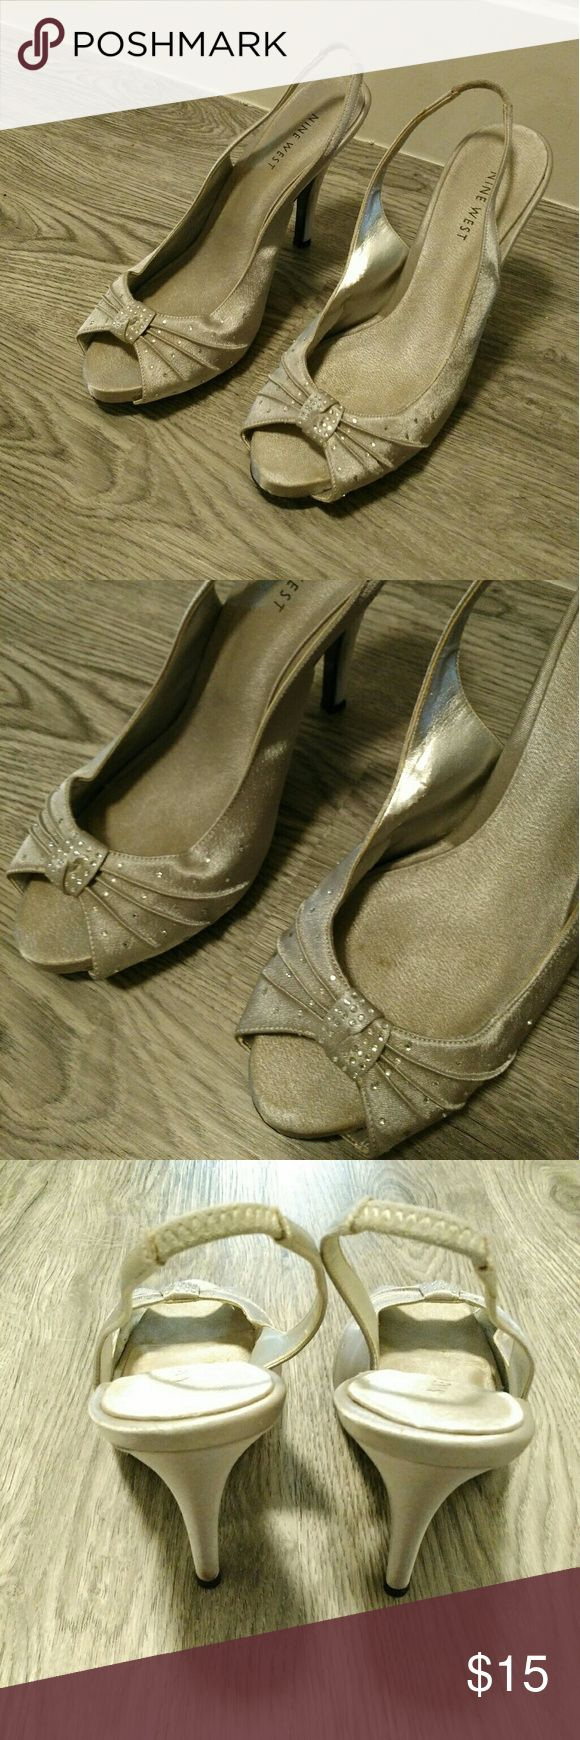 Silver Rhinestone Heels GUC! 4 inch heel and 1/4 inch front platform. Nine West Shoes